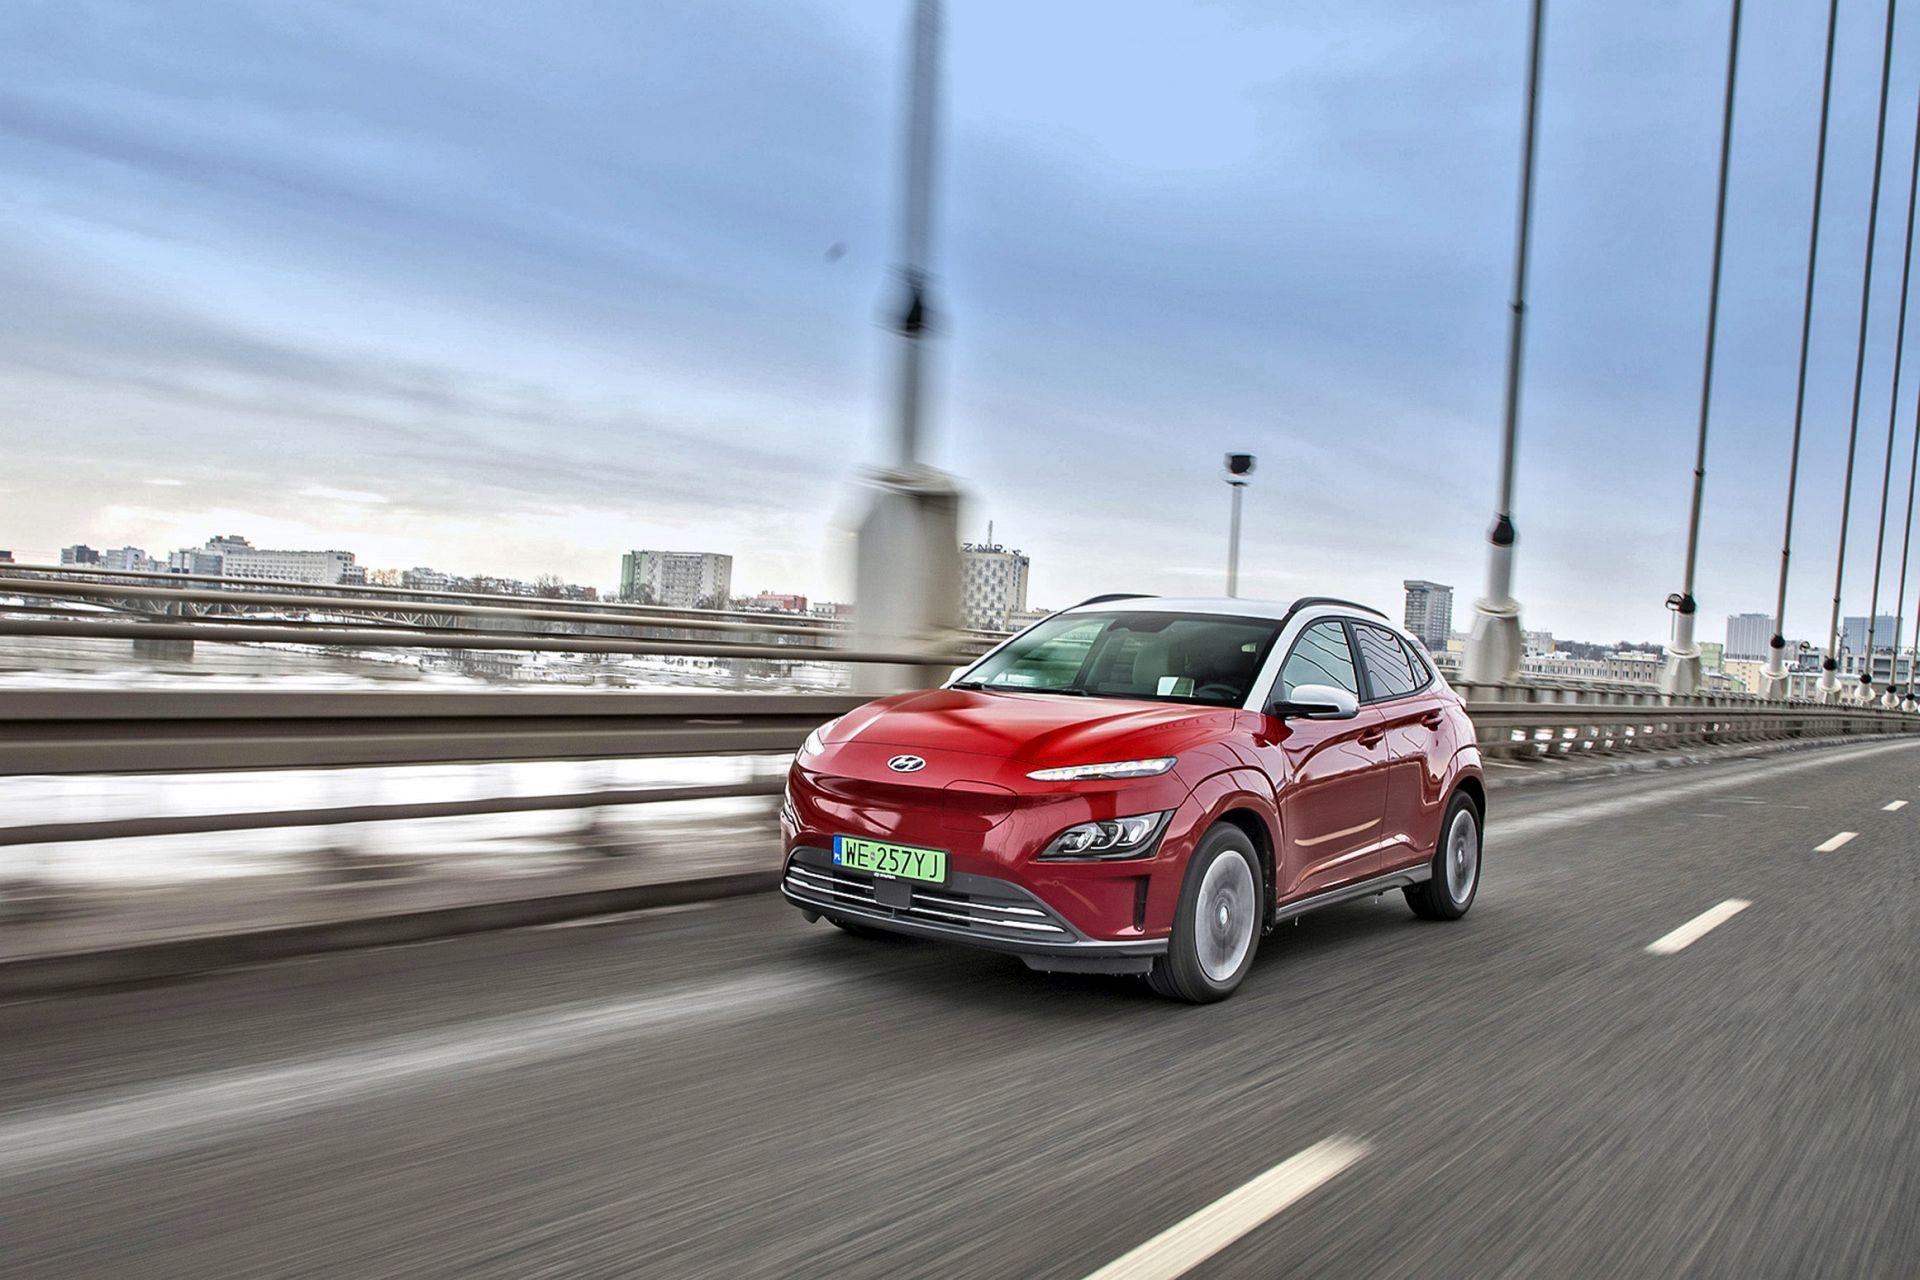 2021 Hyundai Kona electric 64 kWh